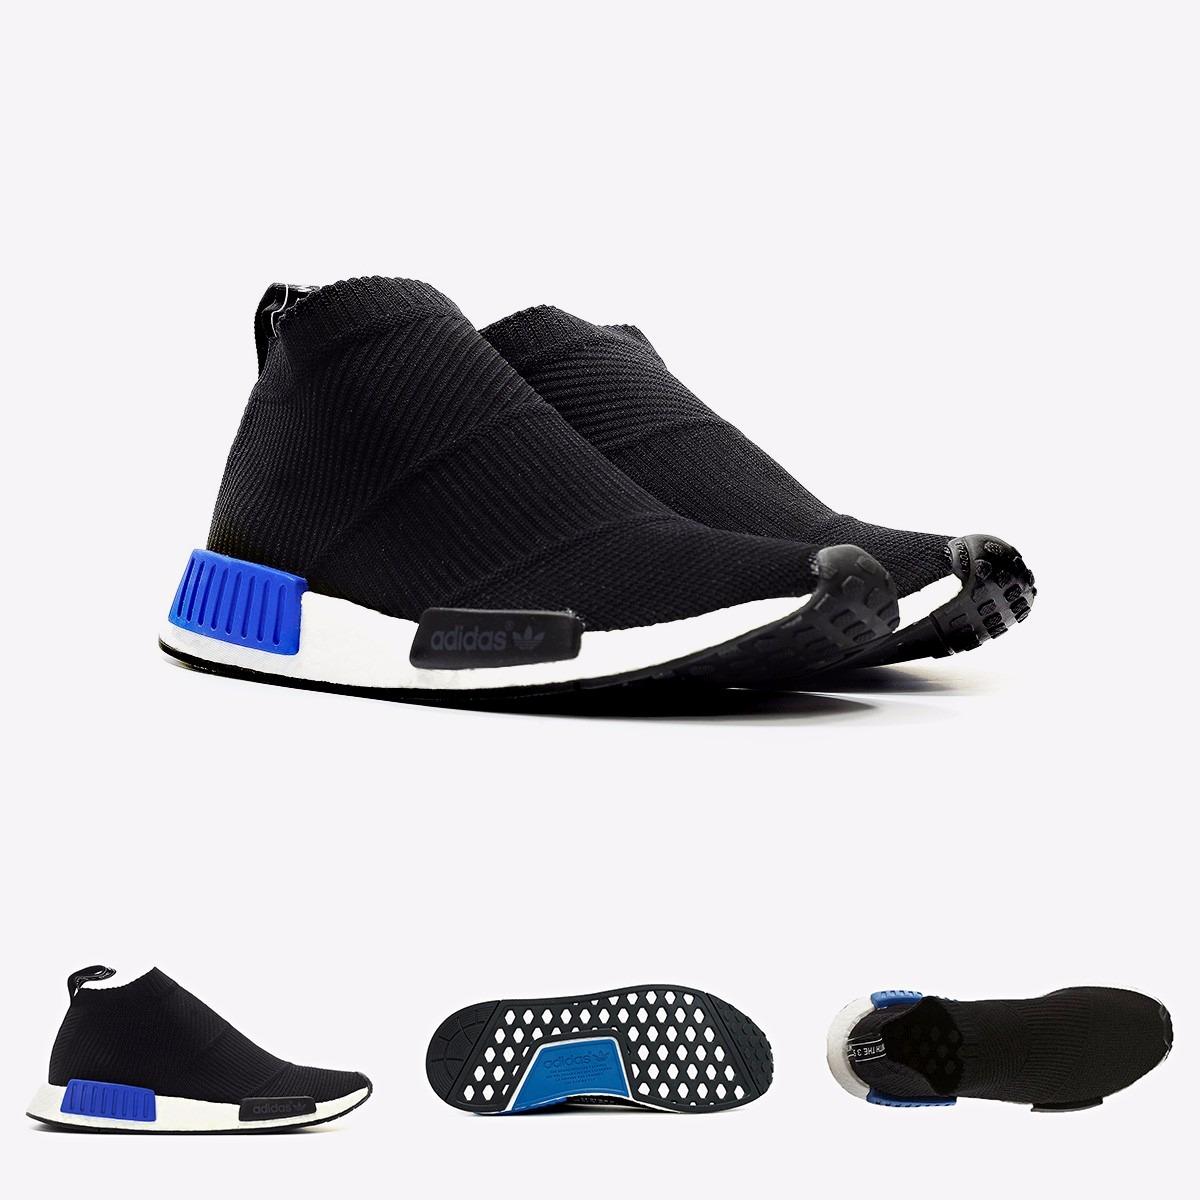 buy popular 52255 32c32 Zapatillas adidas Nmd Ultra Boost City Sock | 2016 Original